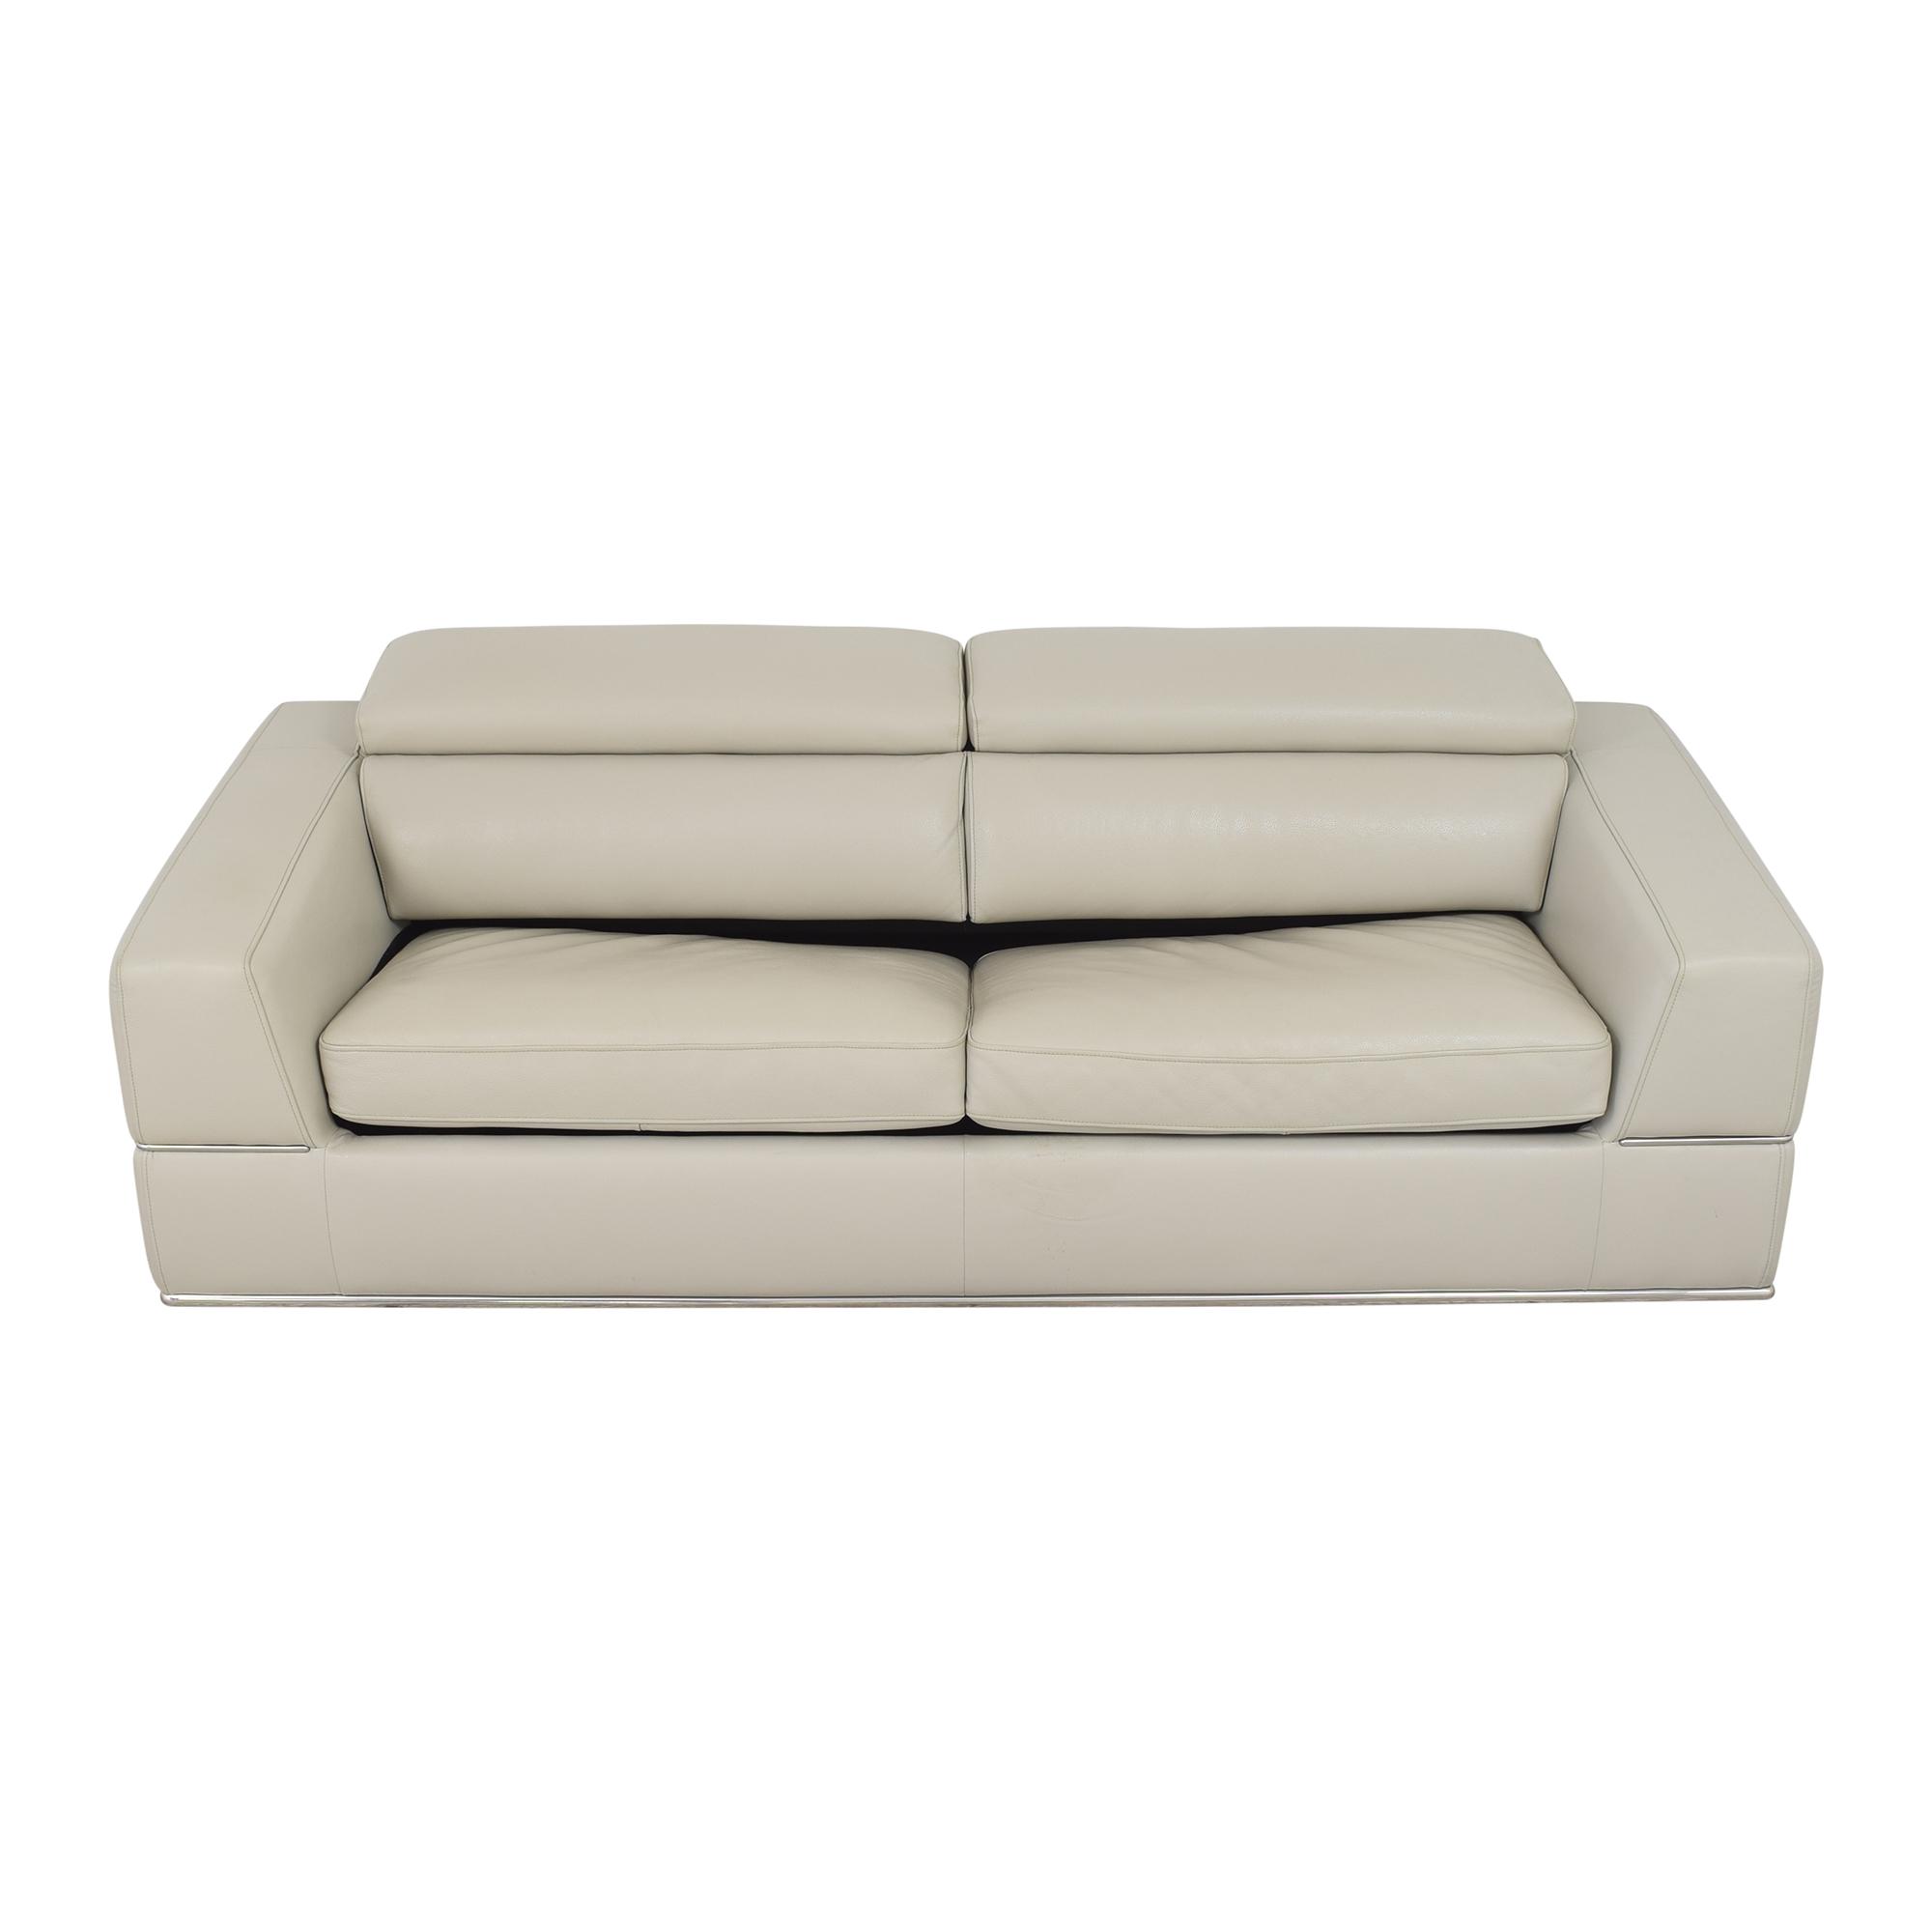 Modani Modani Bergamo Queen Sofa Bed nj